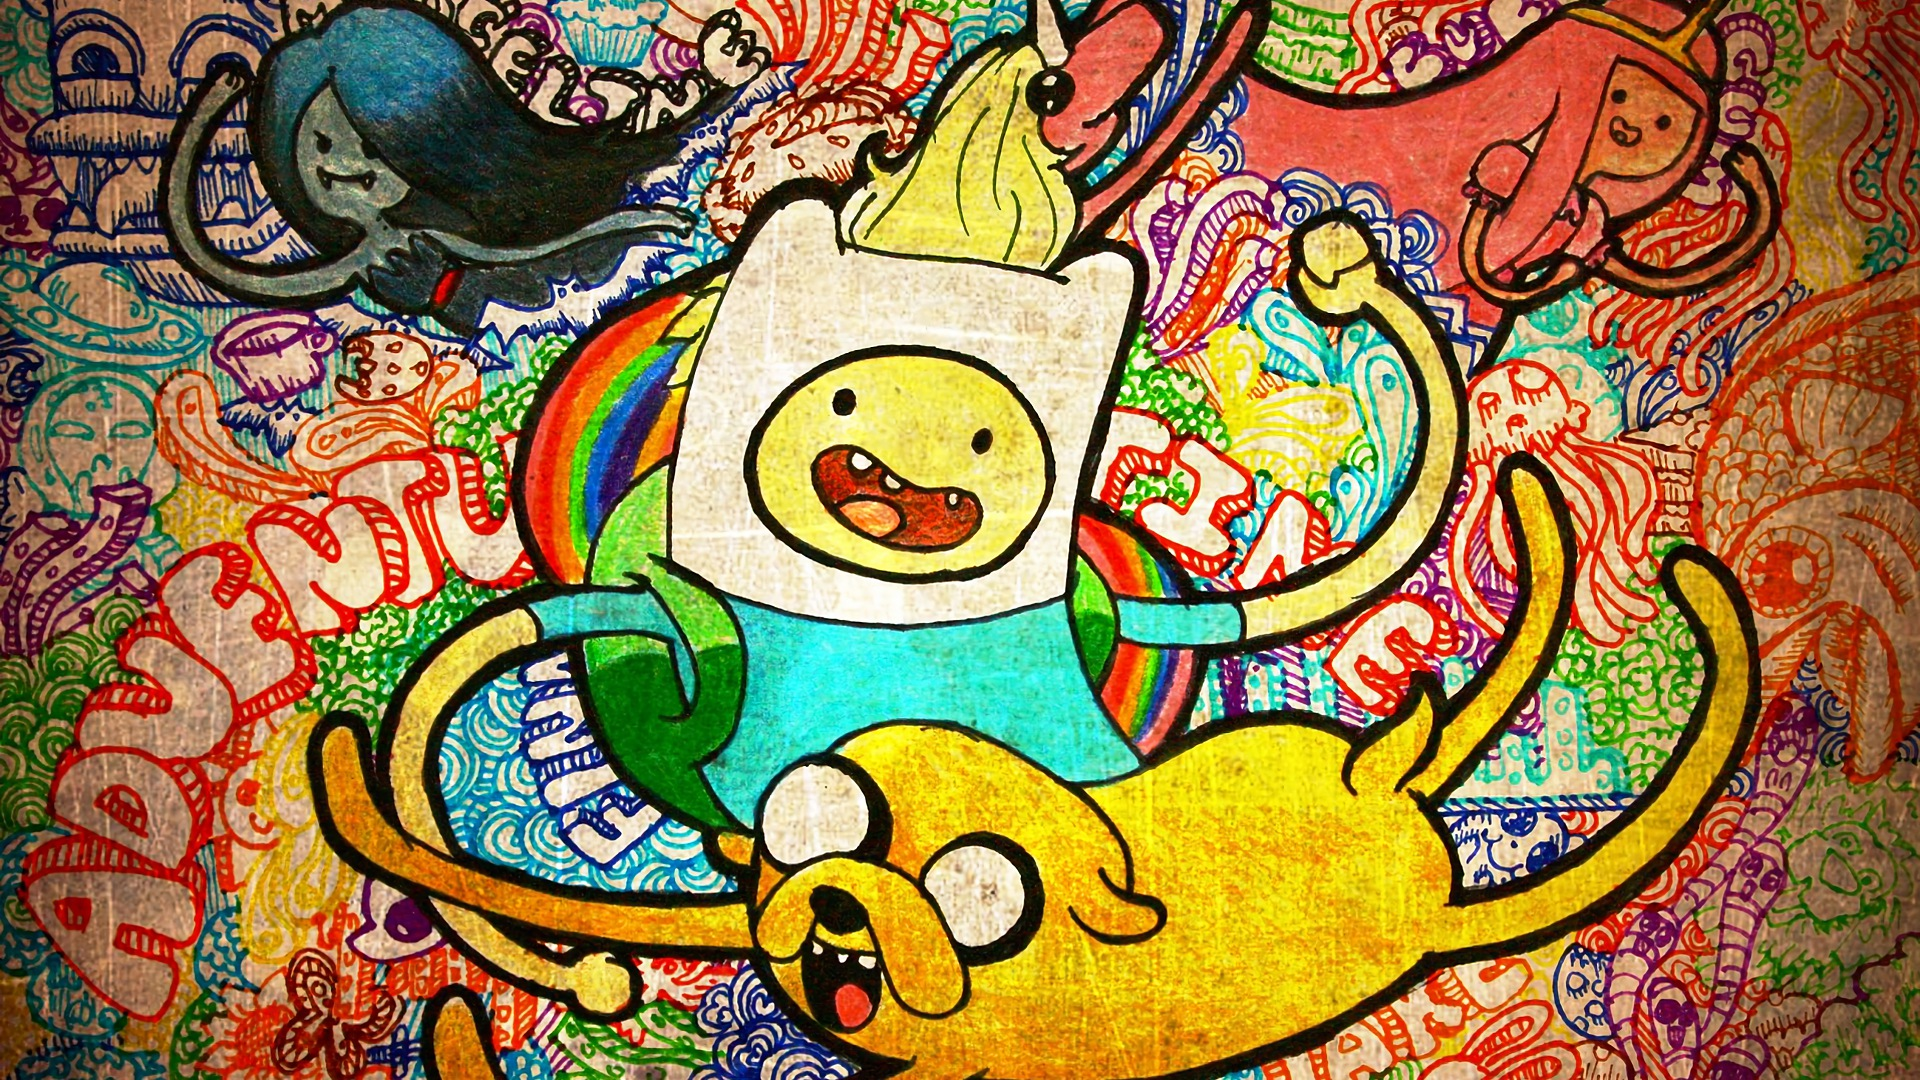 Wallpaper Adventure time, finn and jake, graffiti, colorful artwork